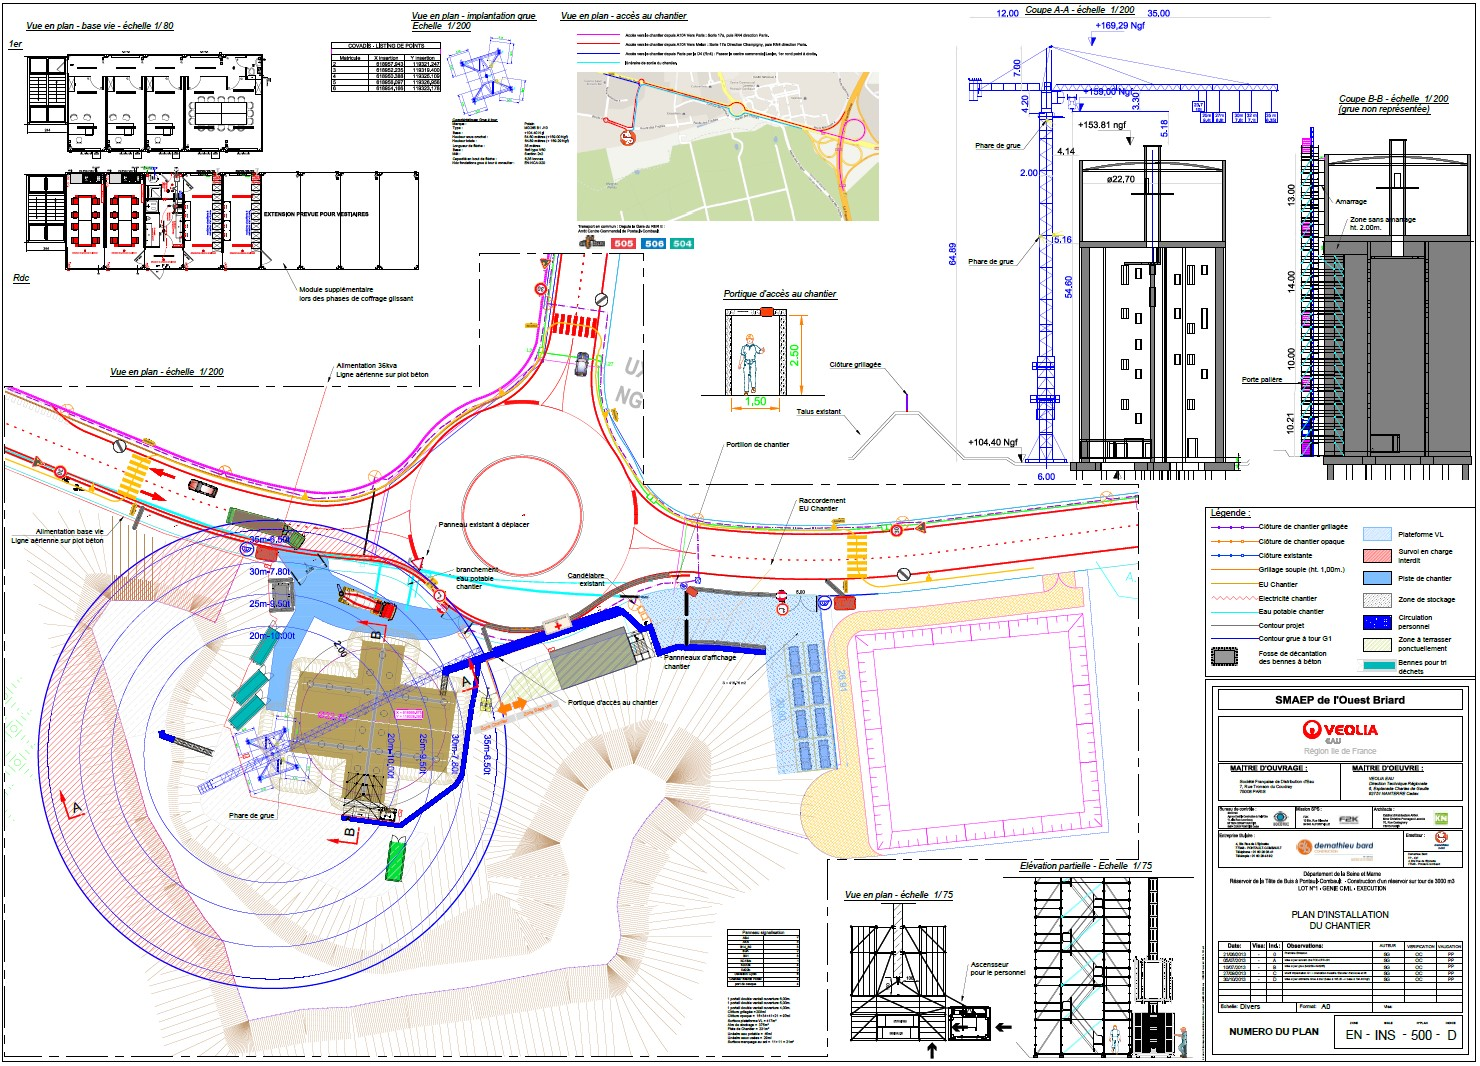 Plan d'installation de chantier d'un château d'eau - Sébastien Garnier